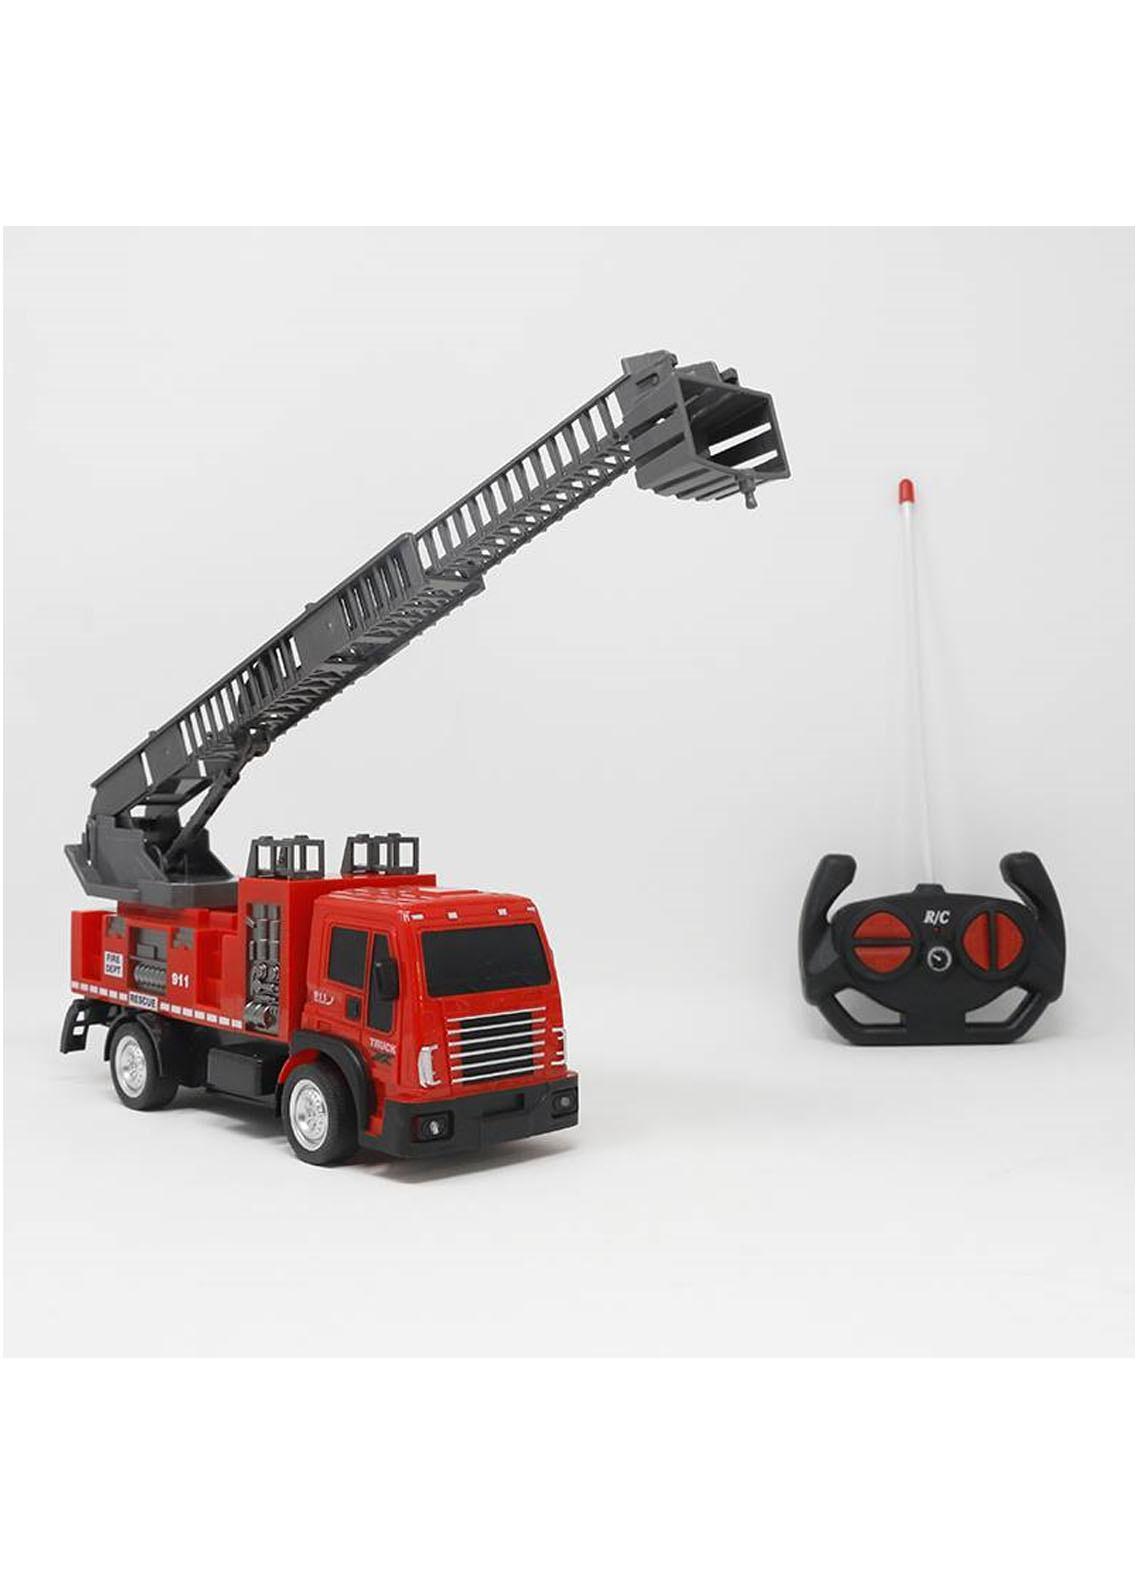 Mumuso REMOTE-CONTROL FIRE ENGINE TOY